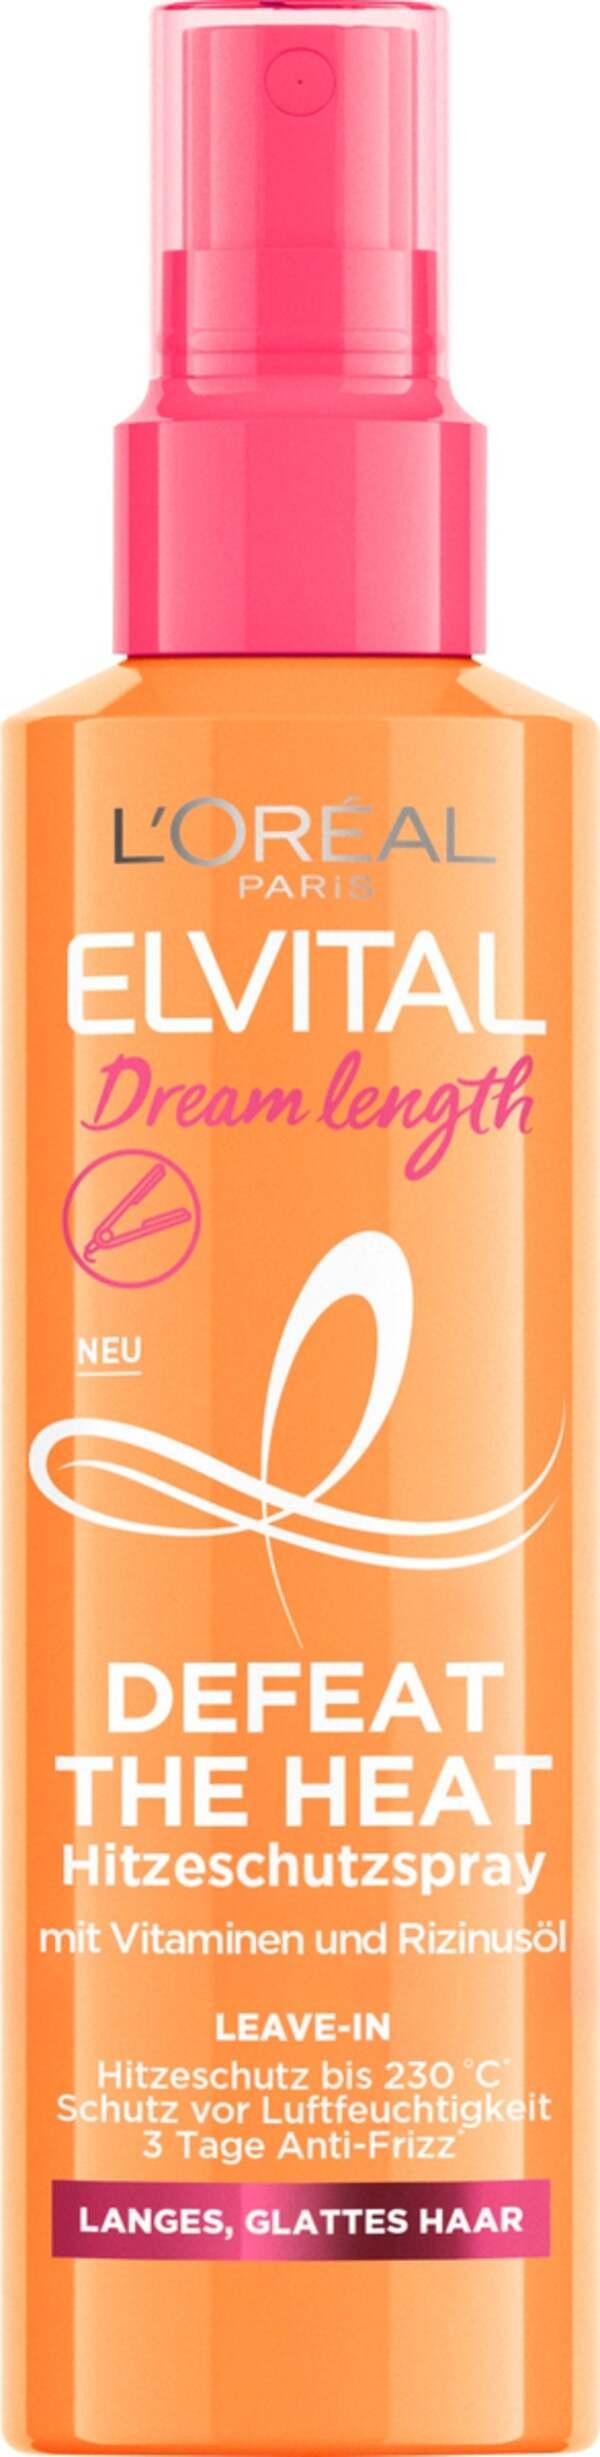 L'Oréal Paris Elvital Dream Length Defeat Heat Hitzeschutzspray